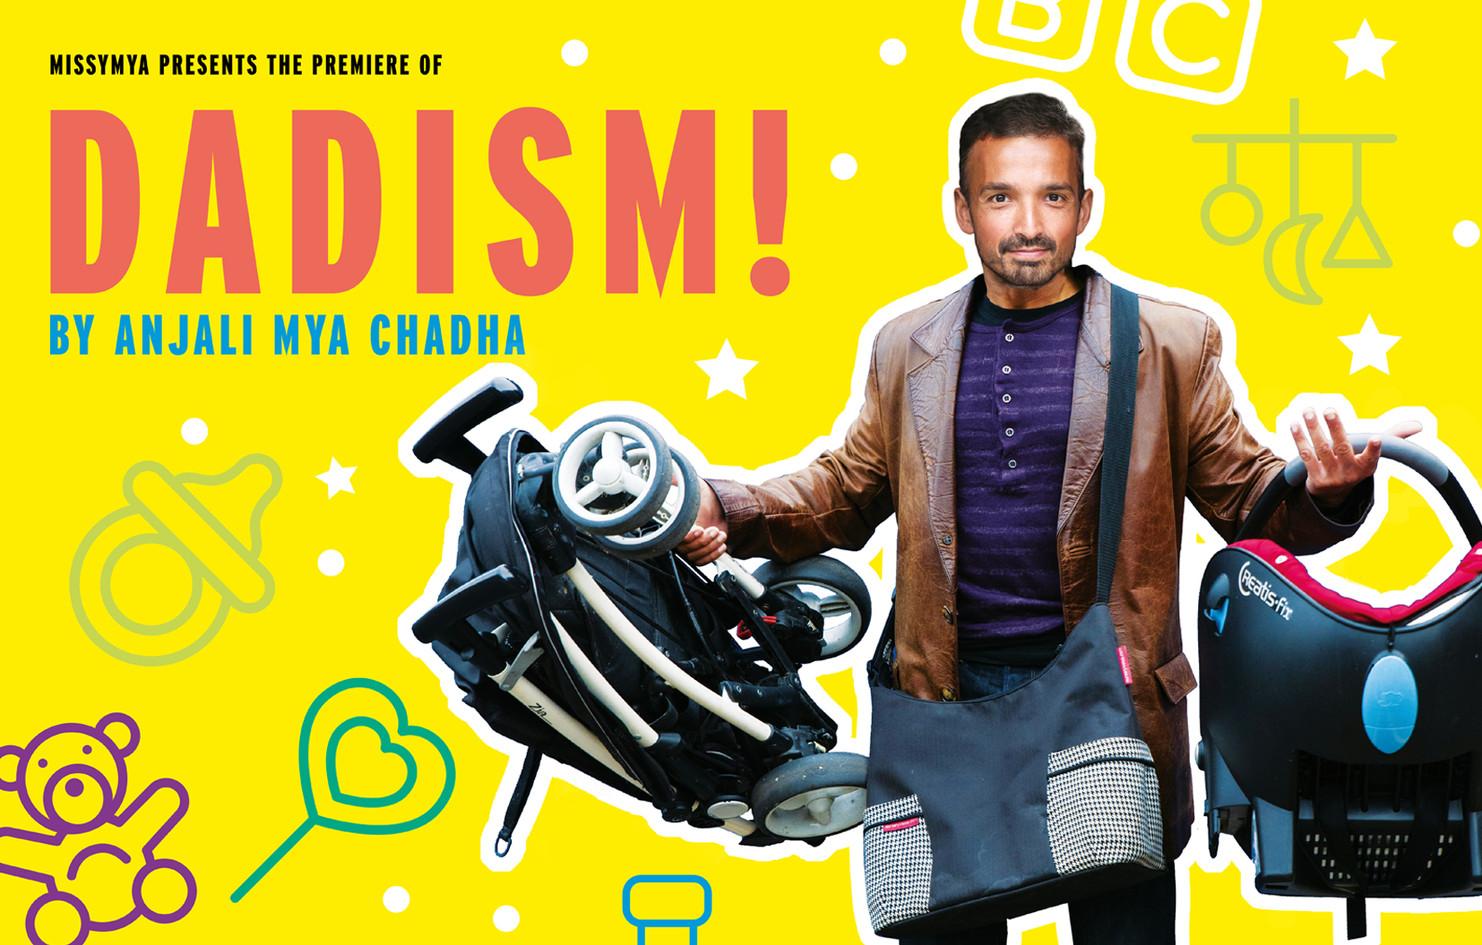 Dadism